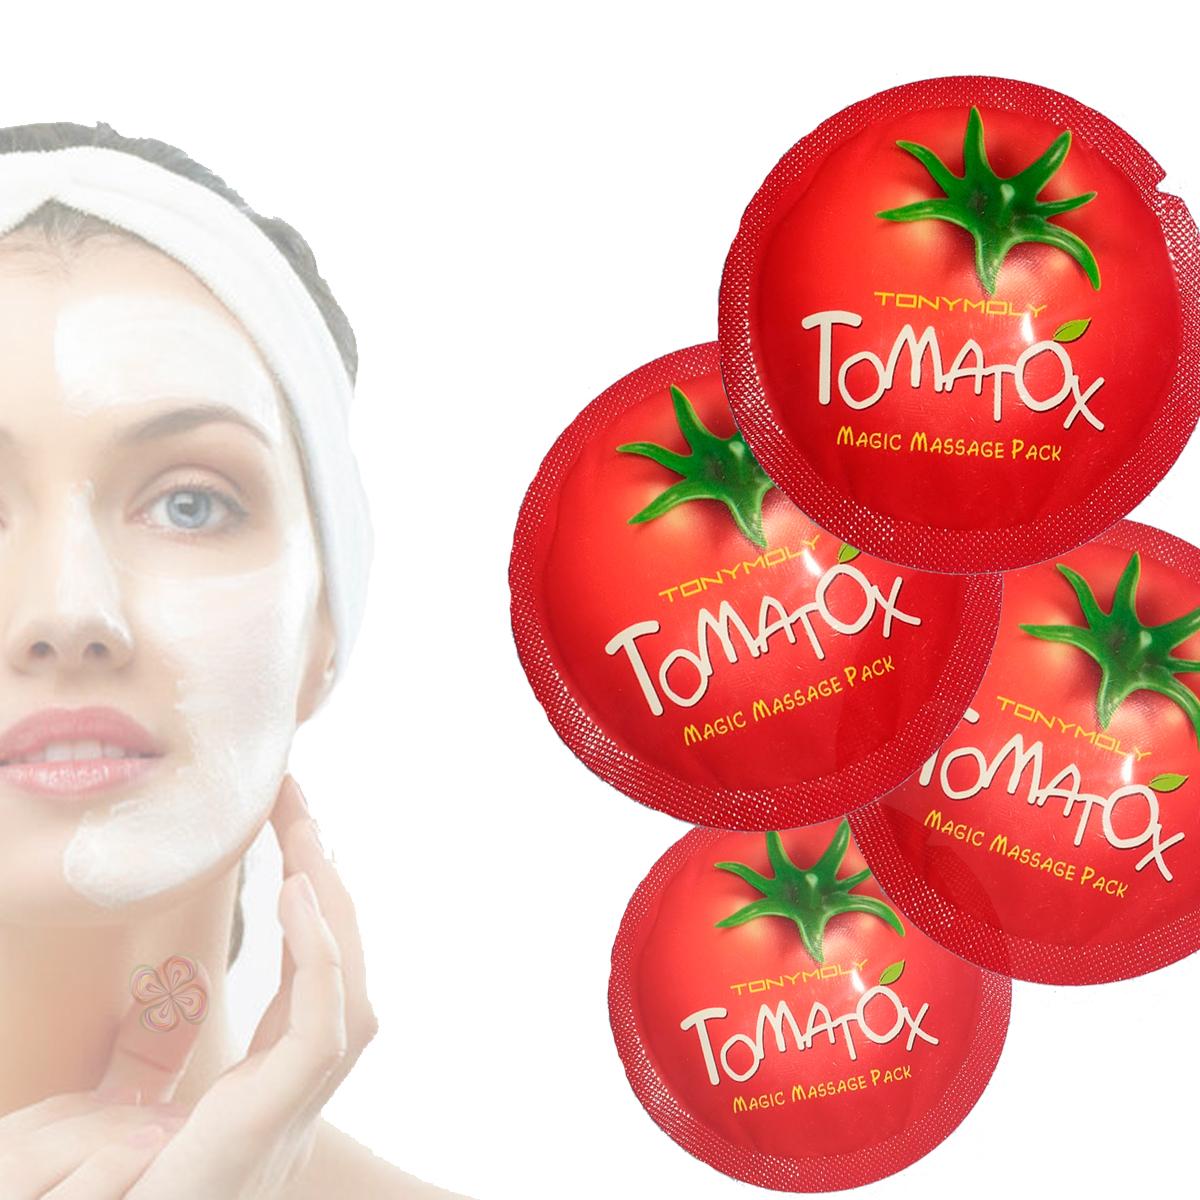 Tomatox Tony Moly Crema Aclaradora 100% Original. 10 Pzas.